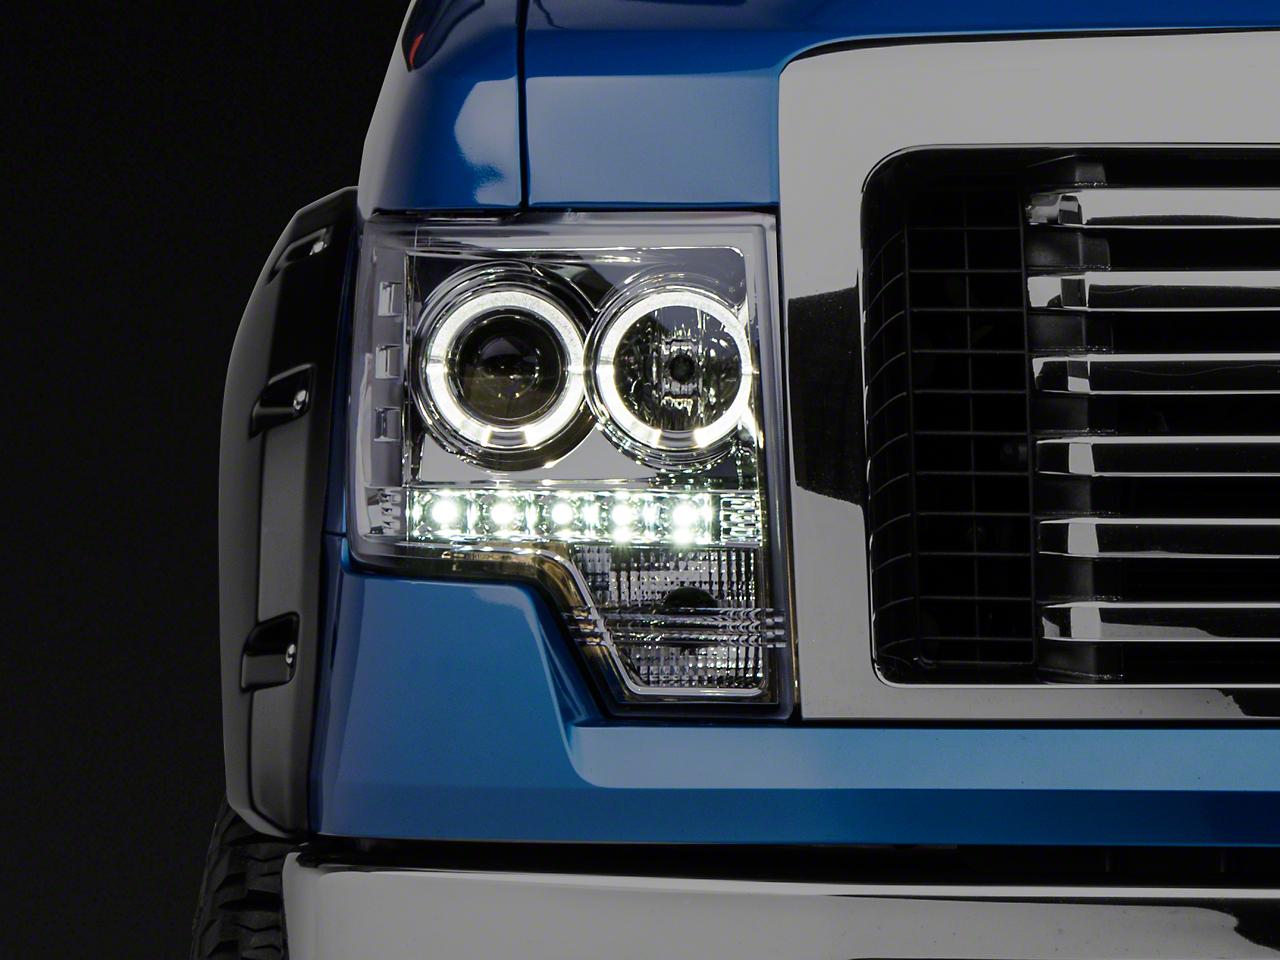 Recon Projector Headlights - Clear Lens (09-14 F-150 w/o Factory Projectors/HIDs)